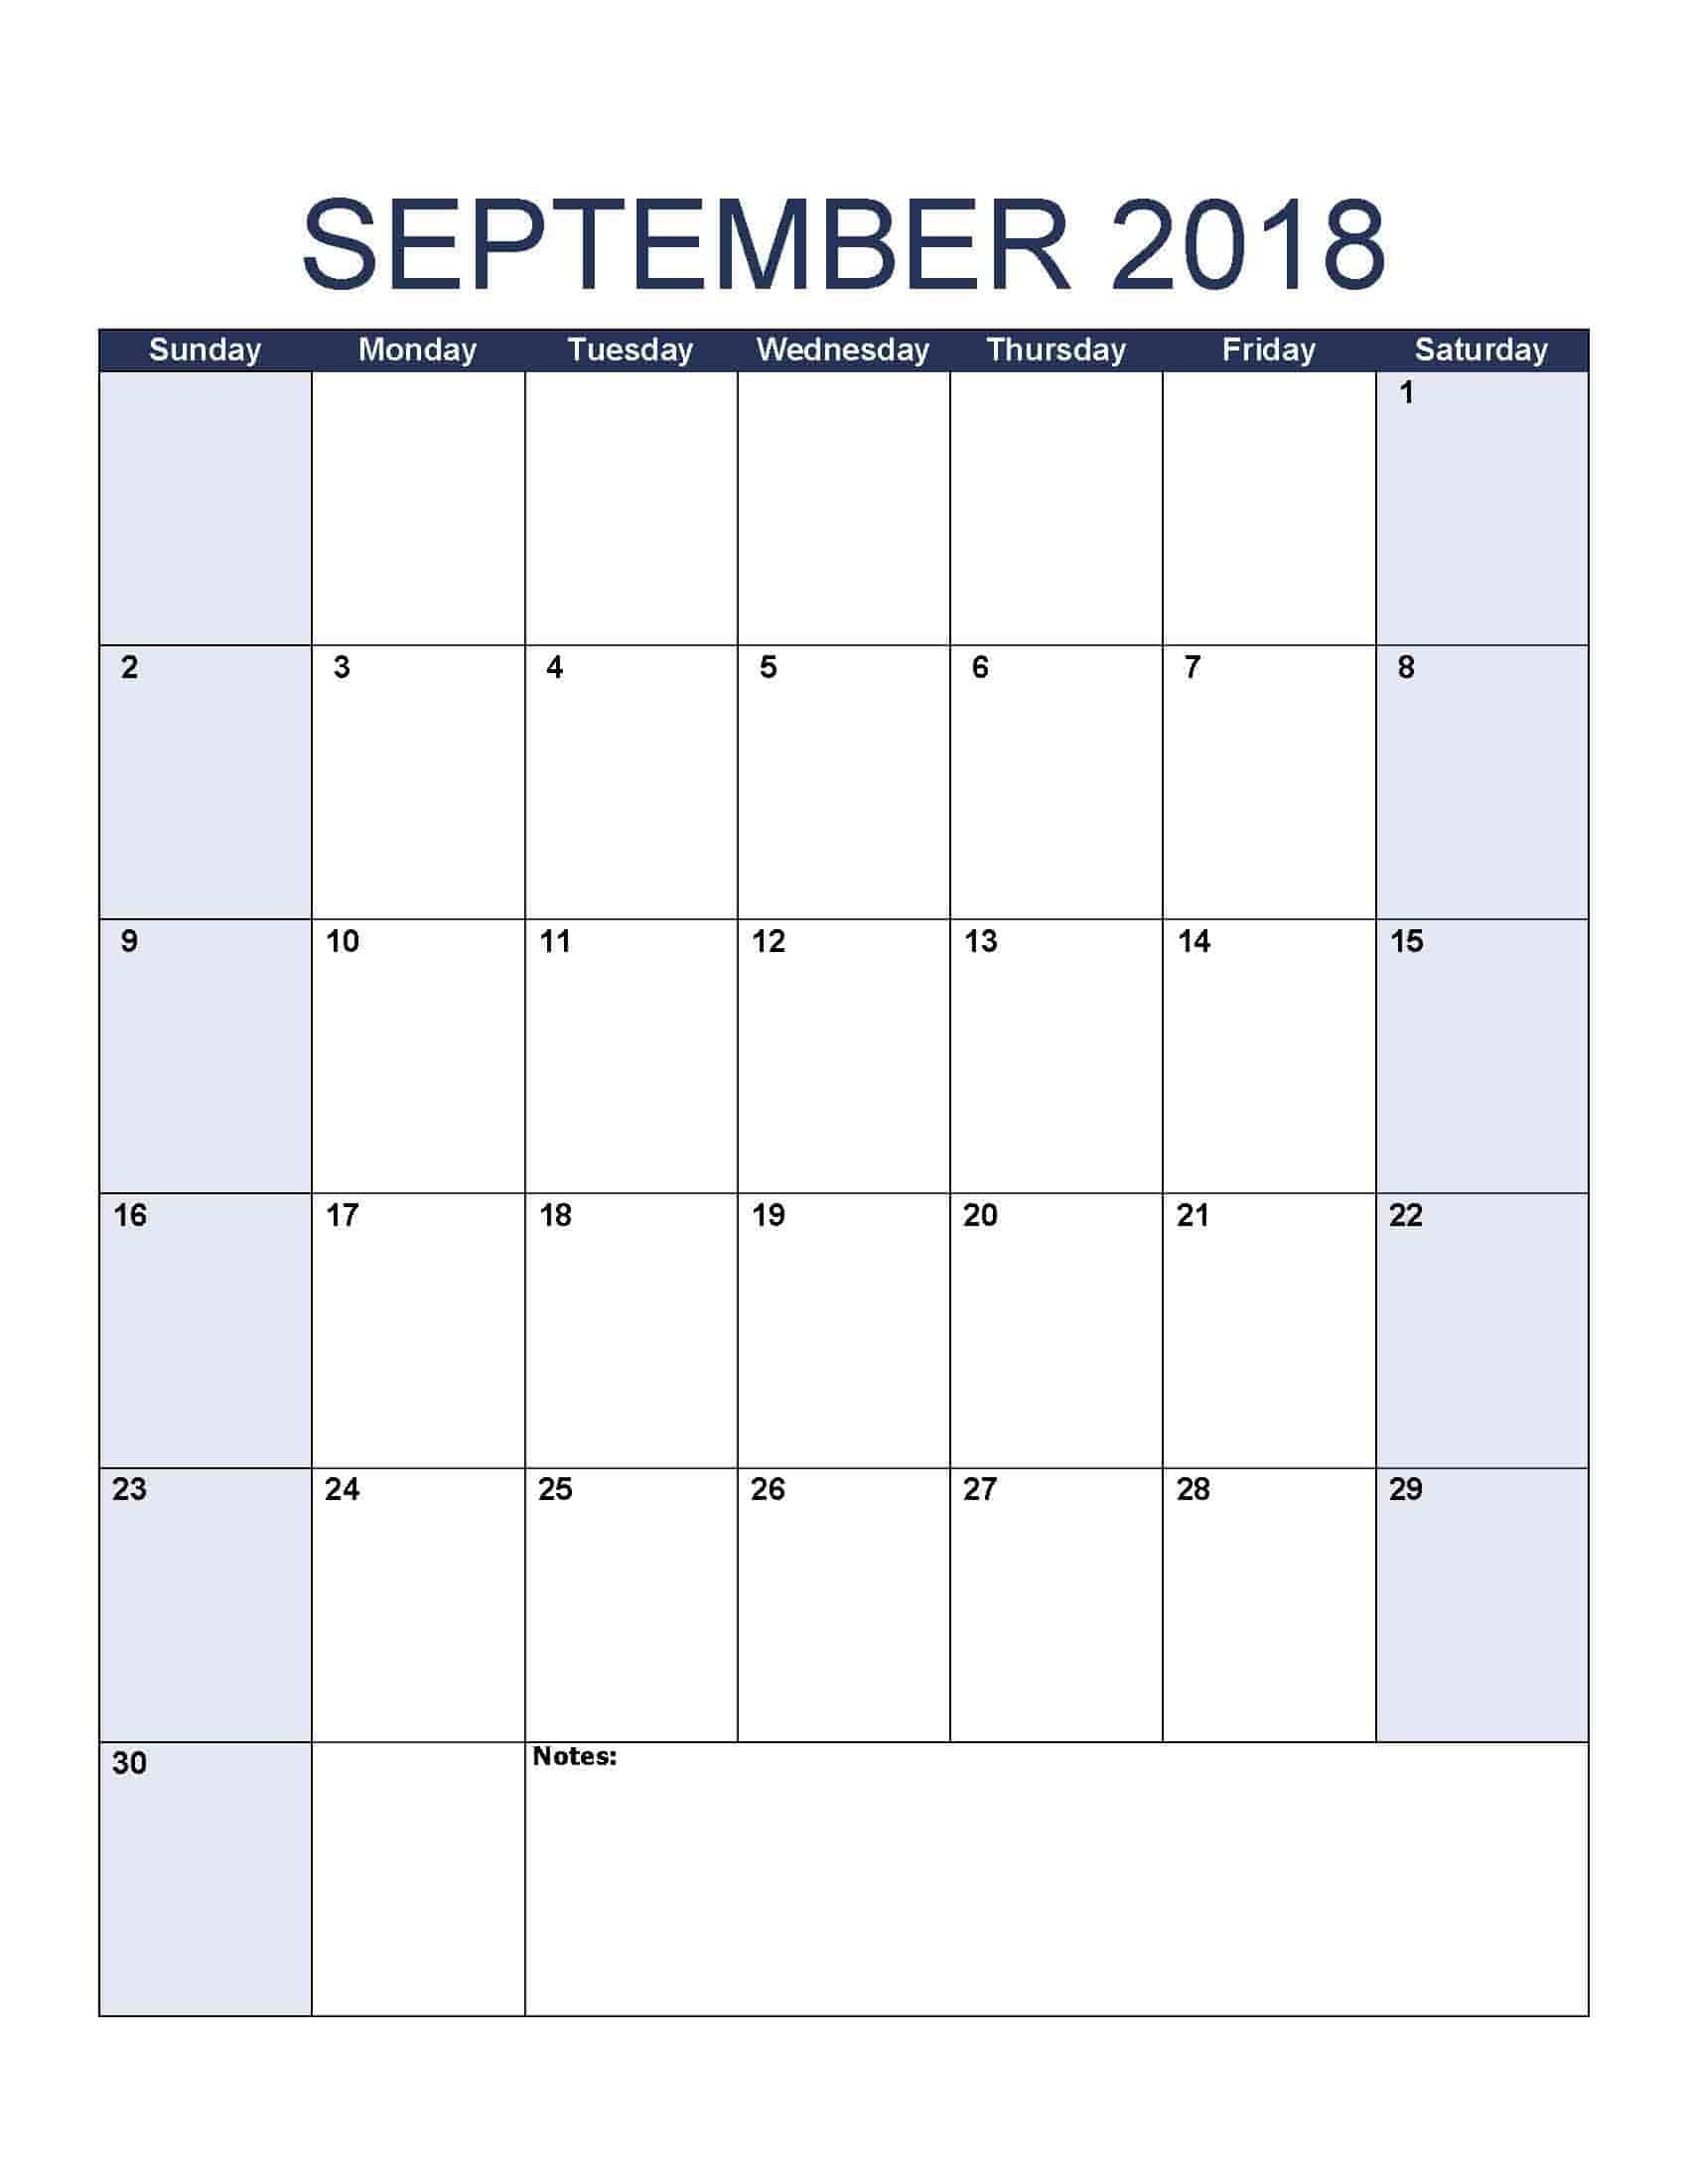 September 2018 Calendar - Free, Printable Calendar Templates